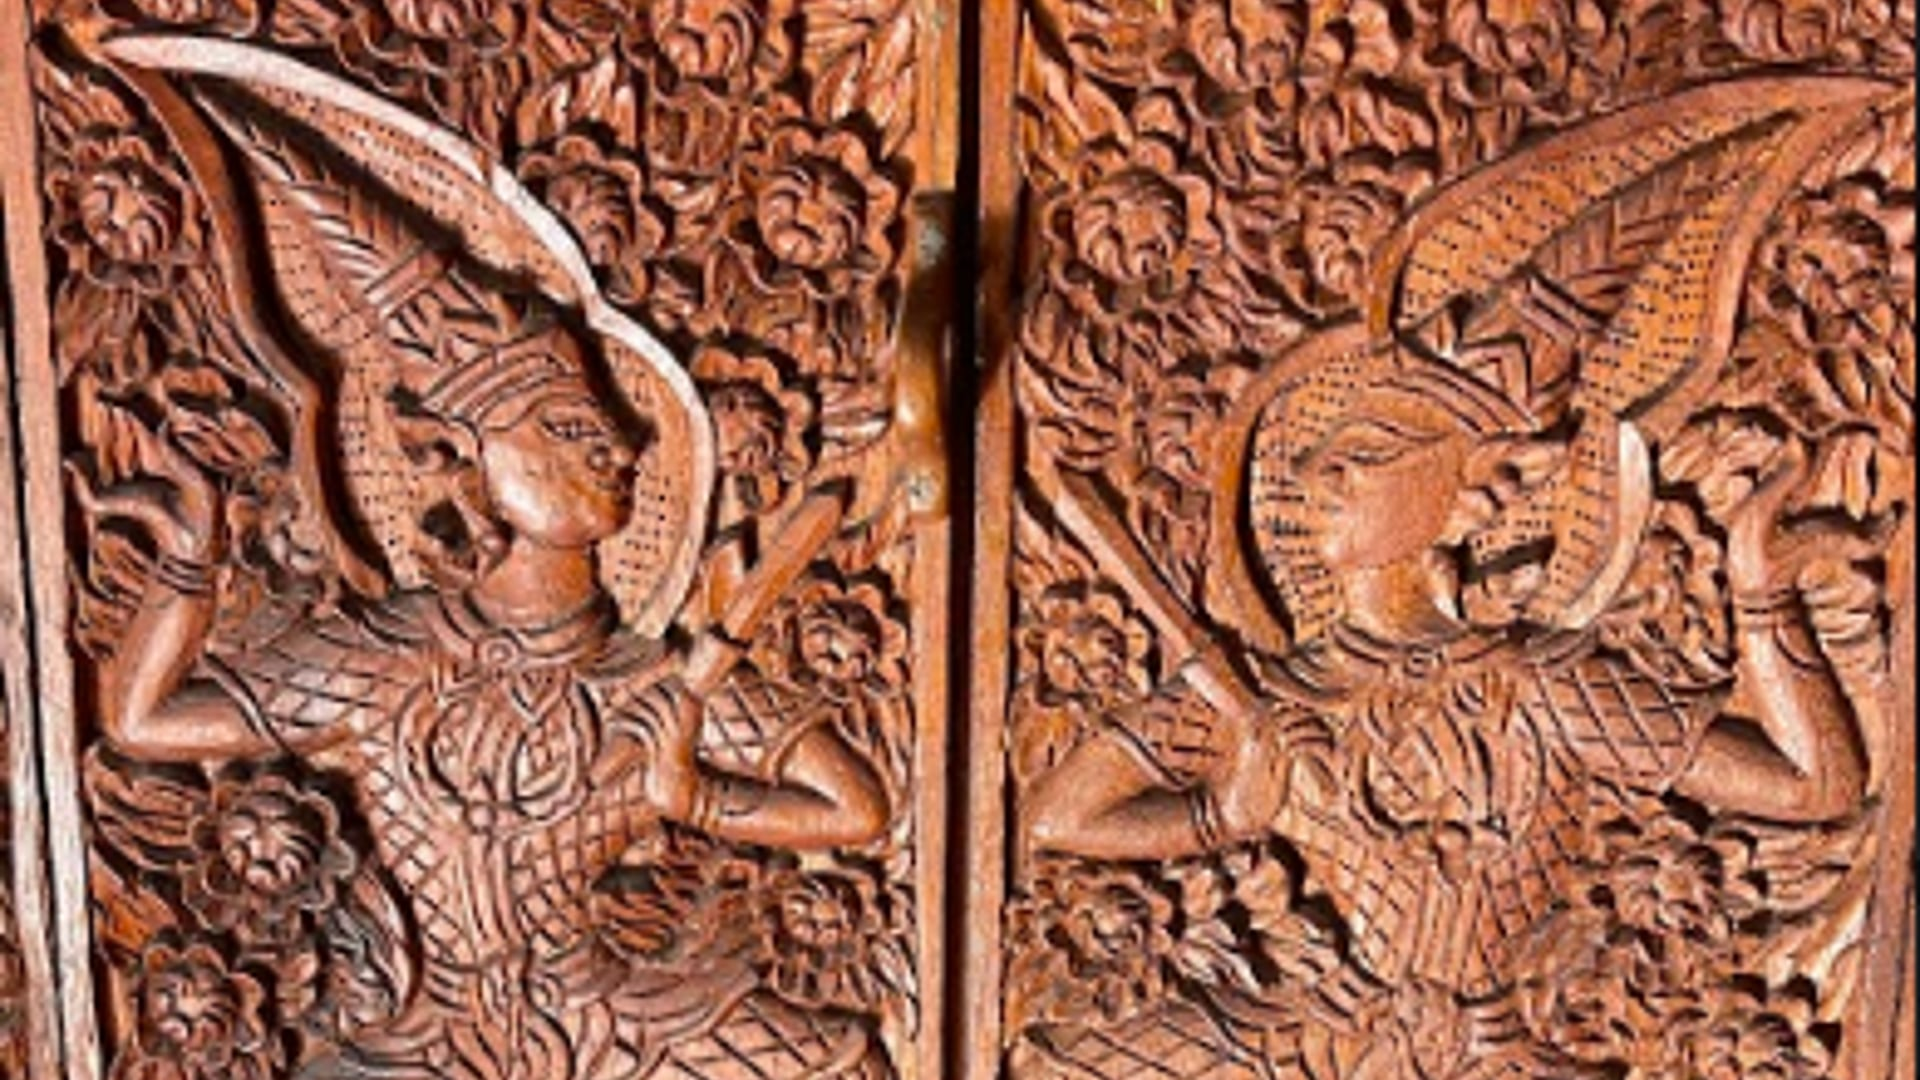 July 05: Striving in Meditation Creates Dukkha